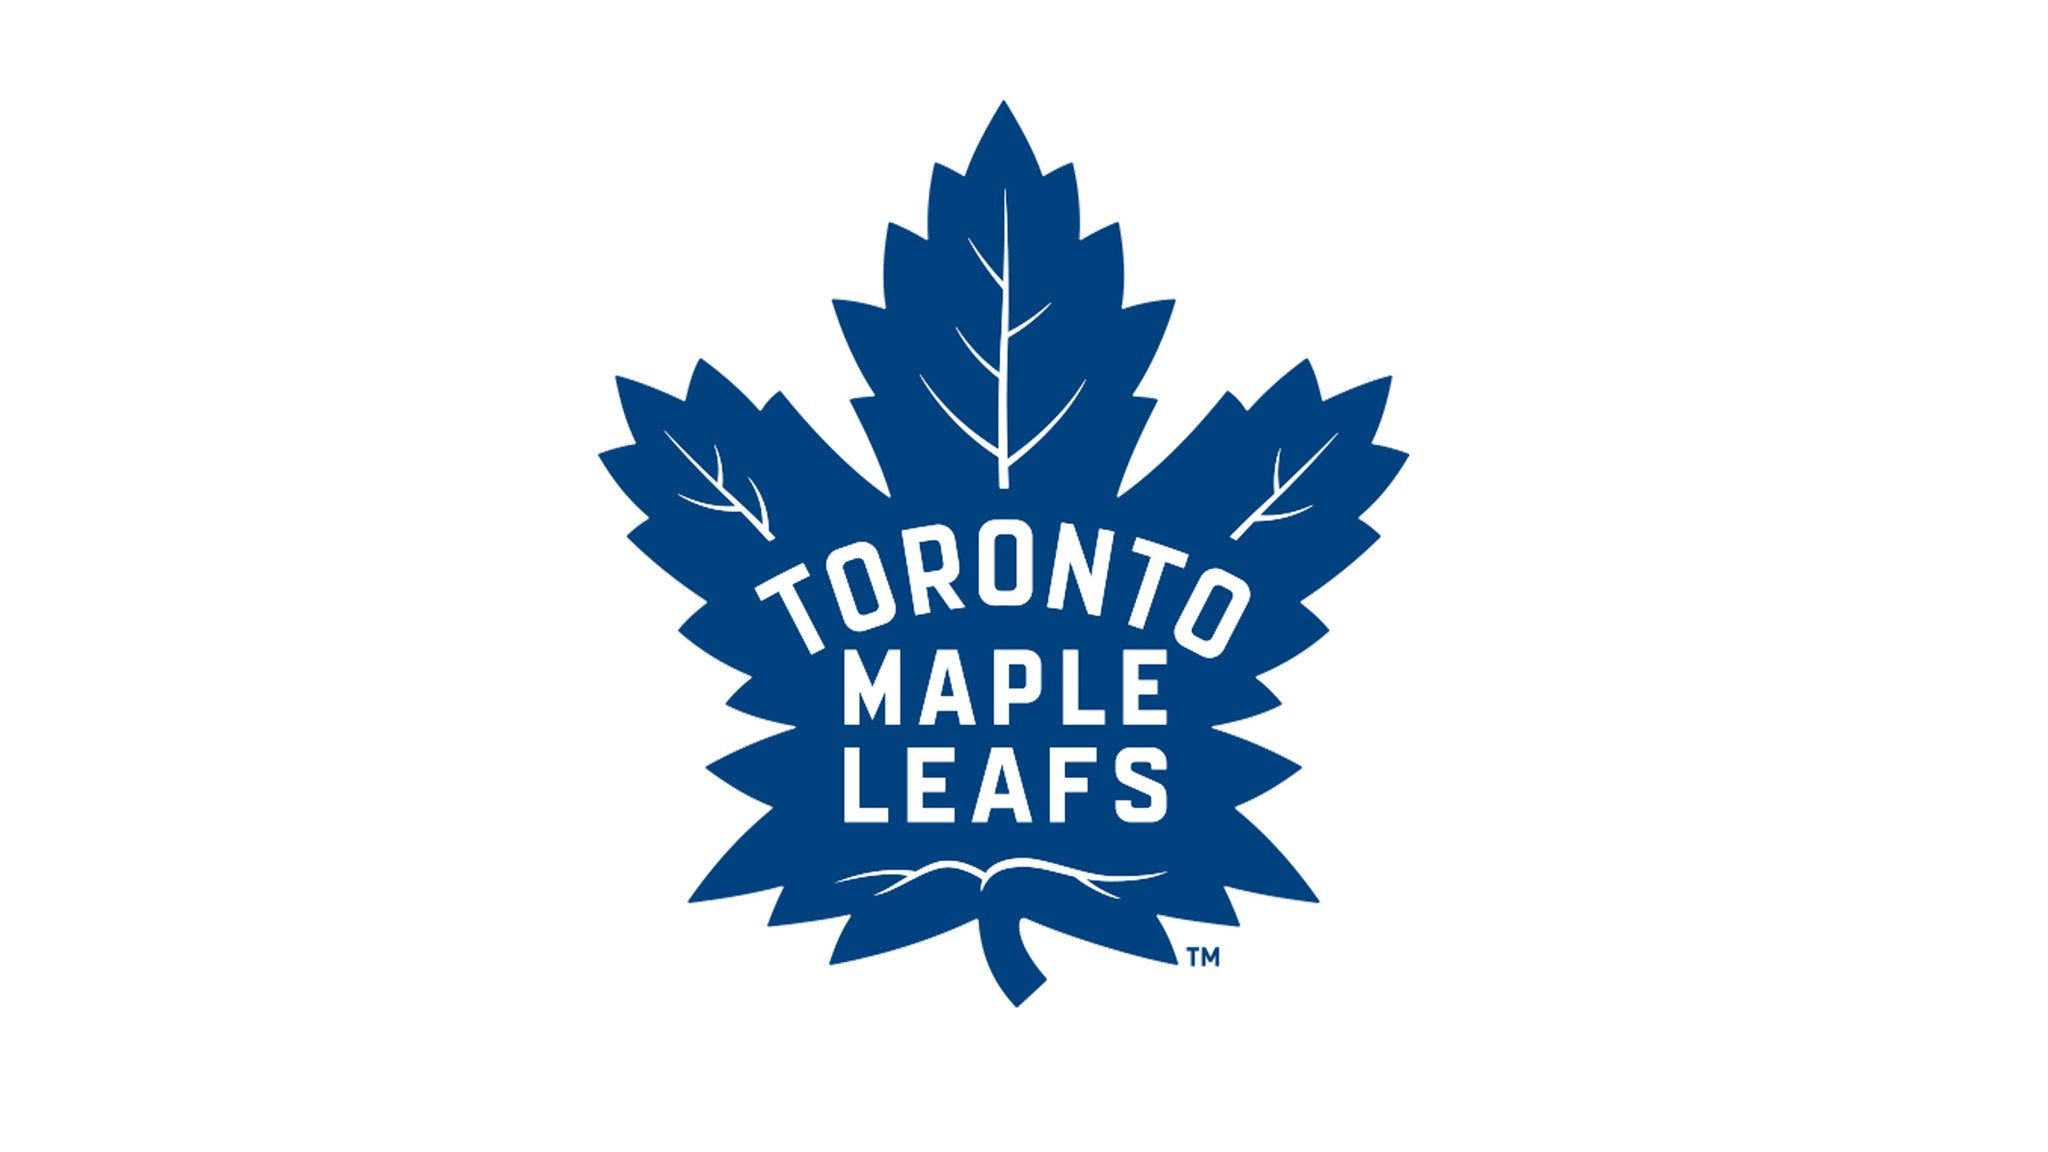 Toronto Maple Leafs vs. Columbus Blue Jackets